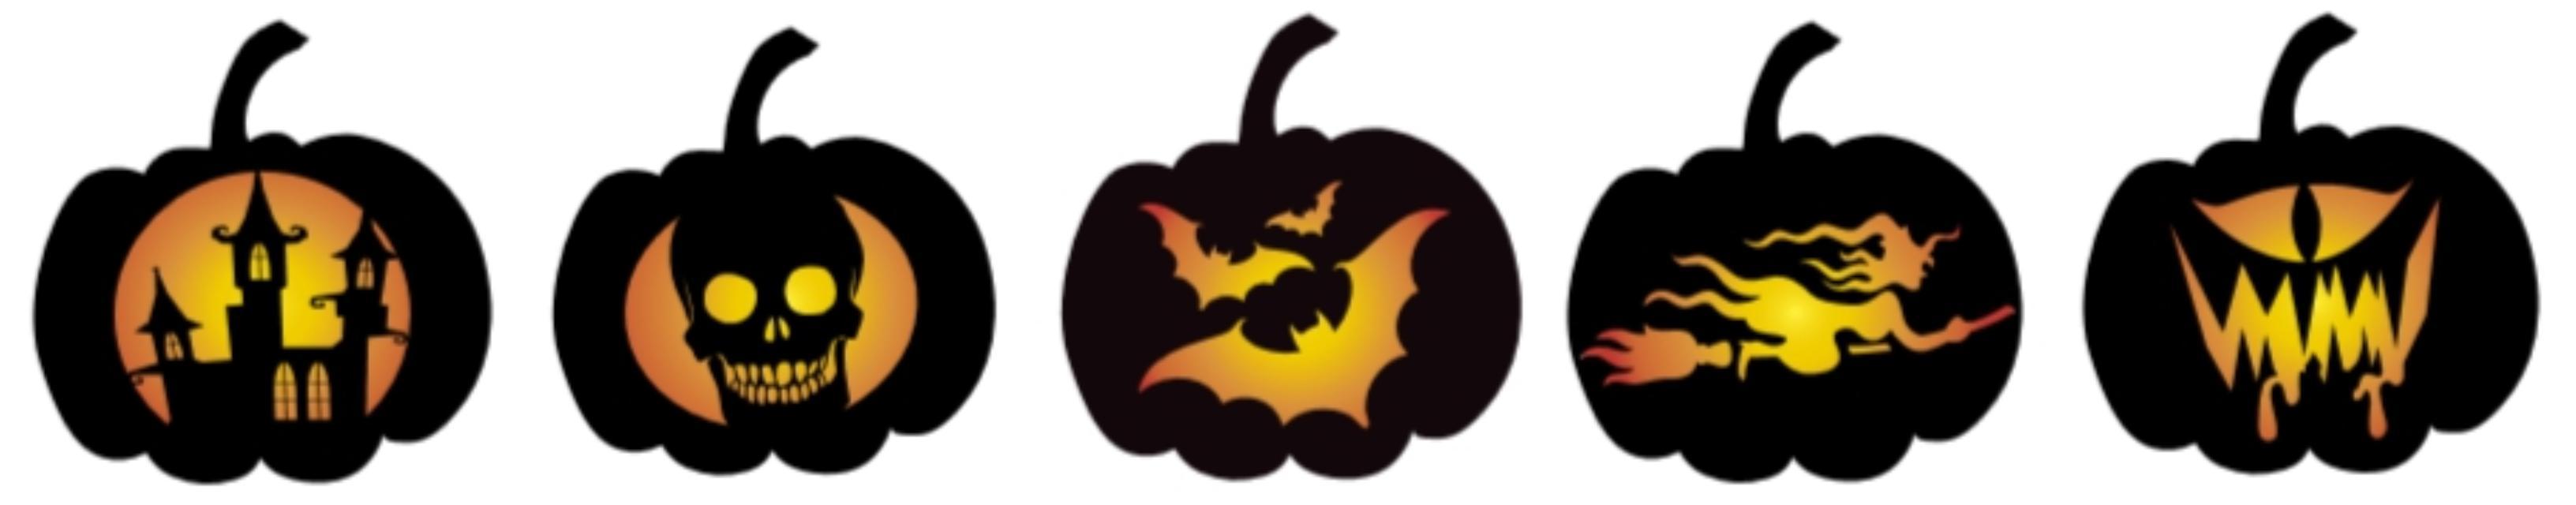 25 free pumpkin carving stencils from depositphotos